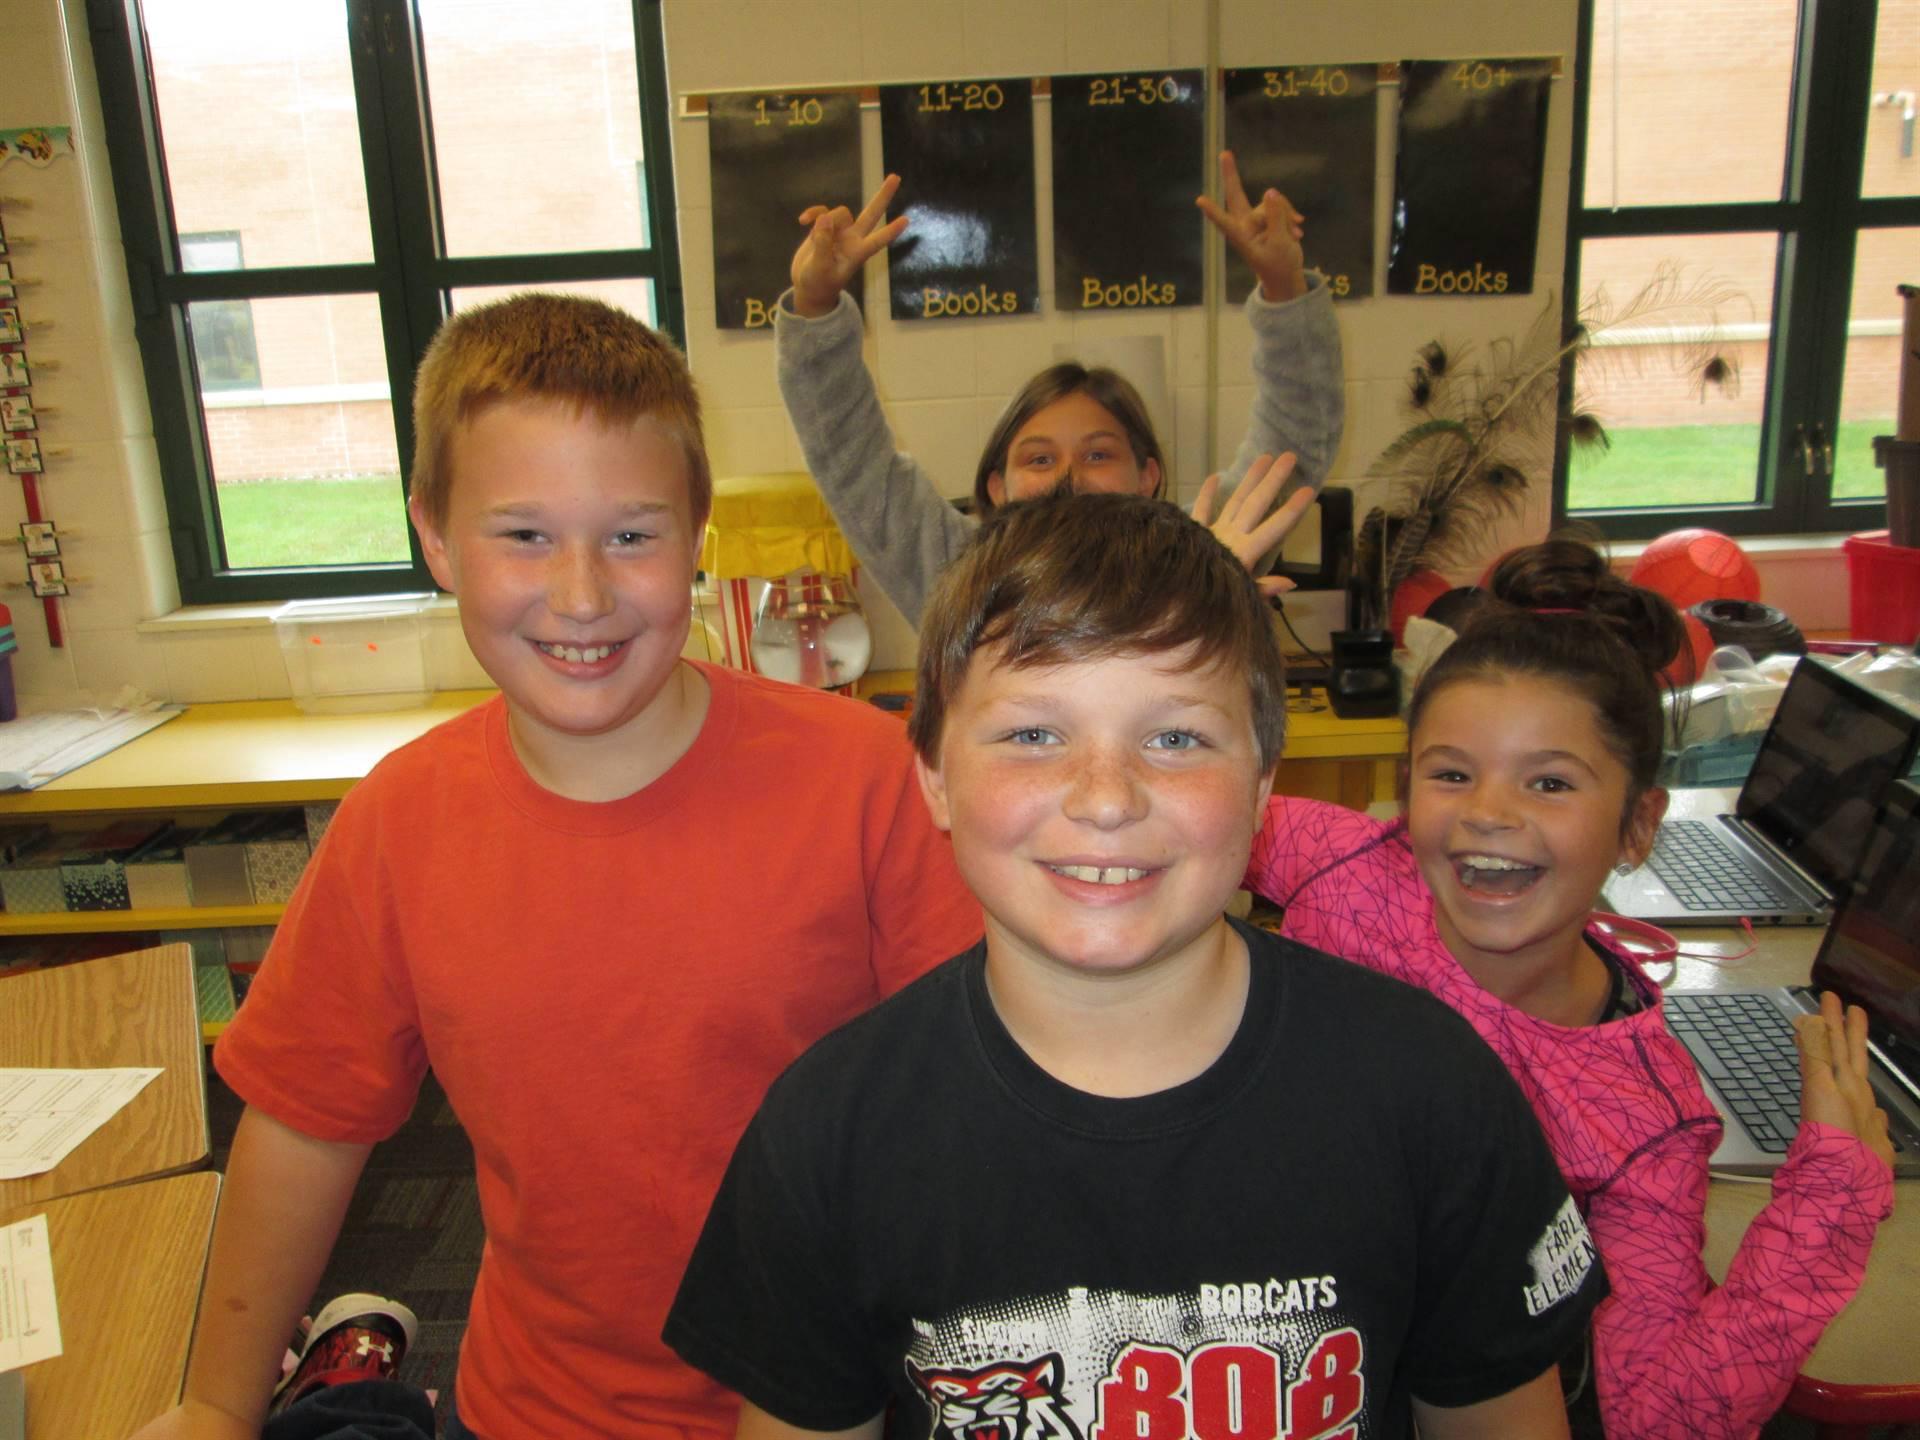 students posing and having fun